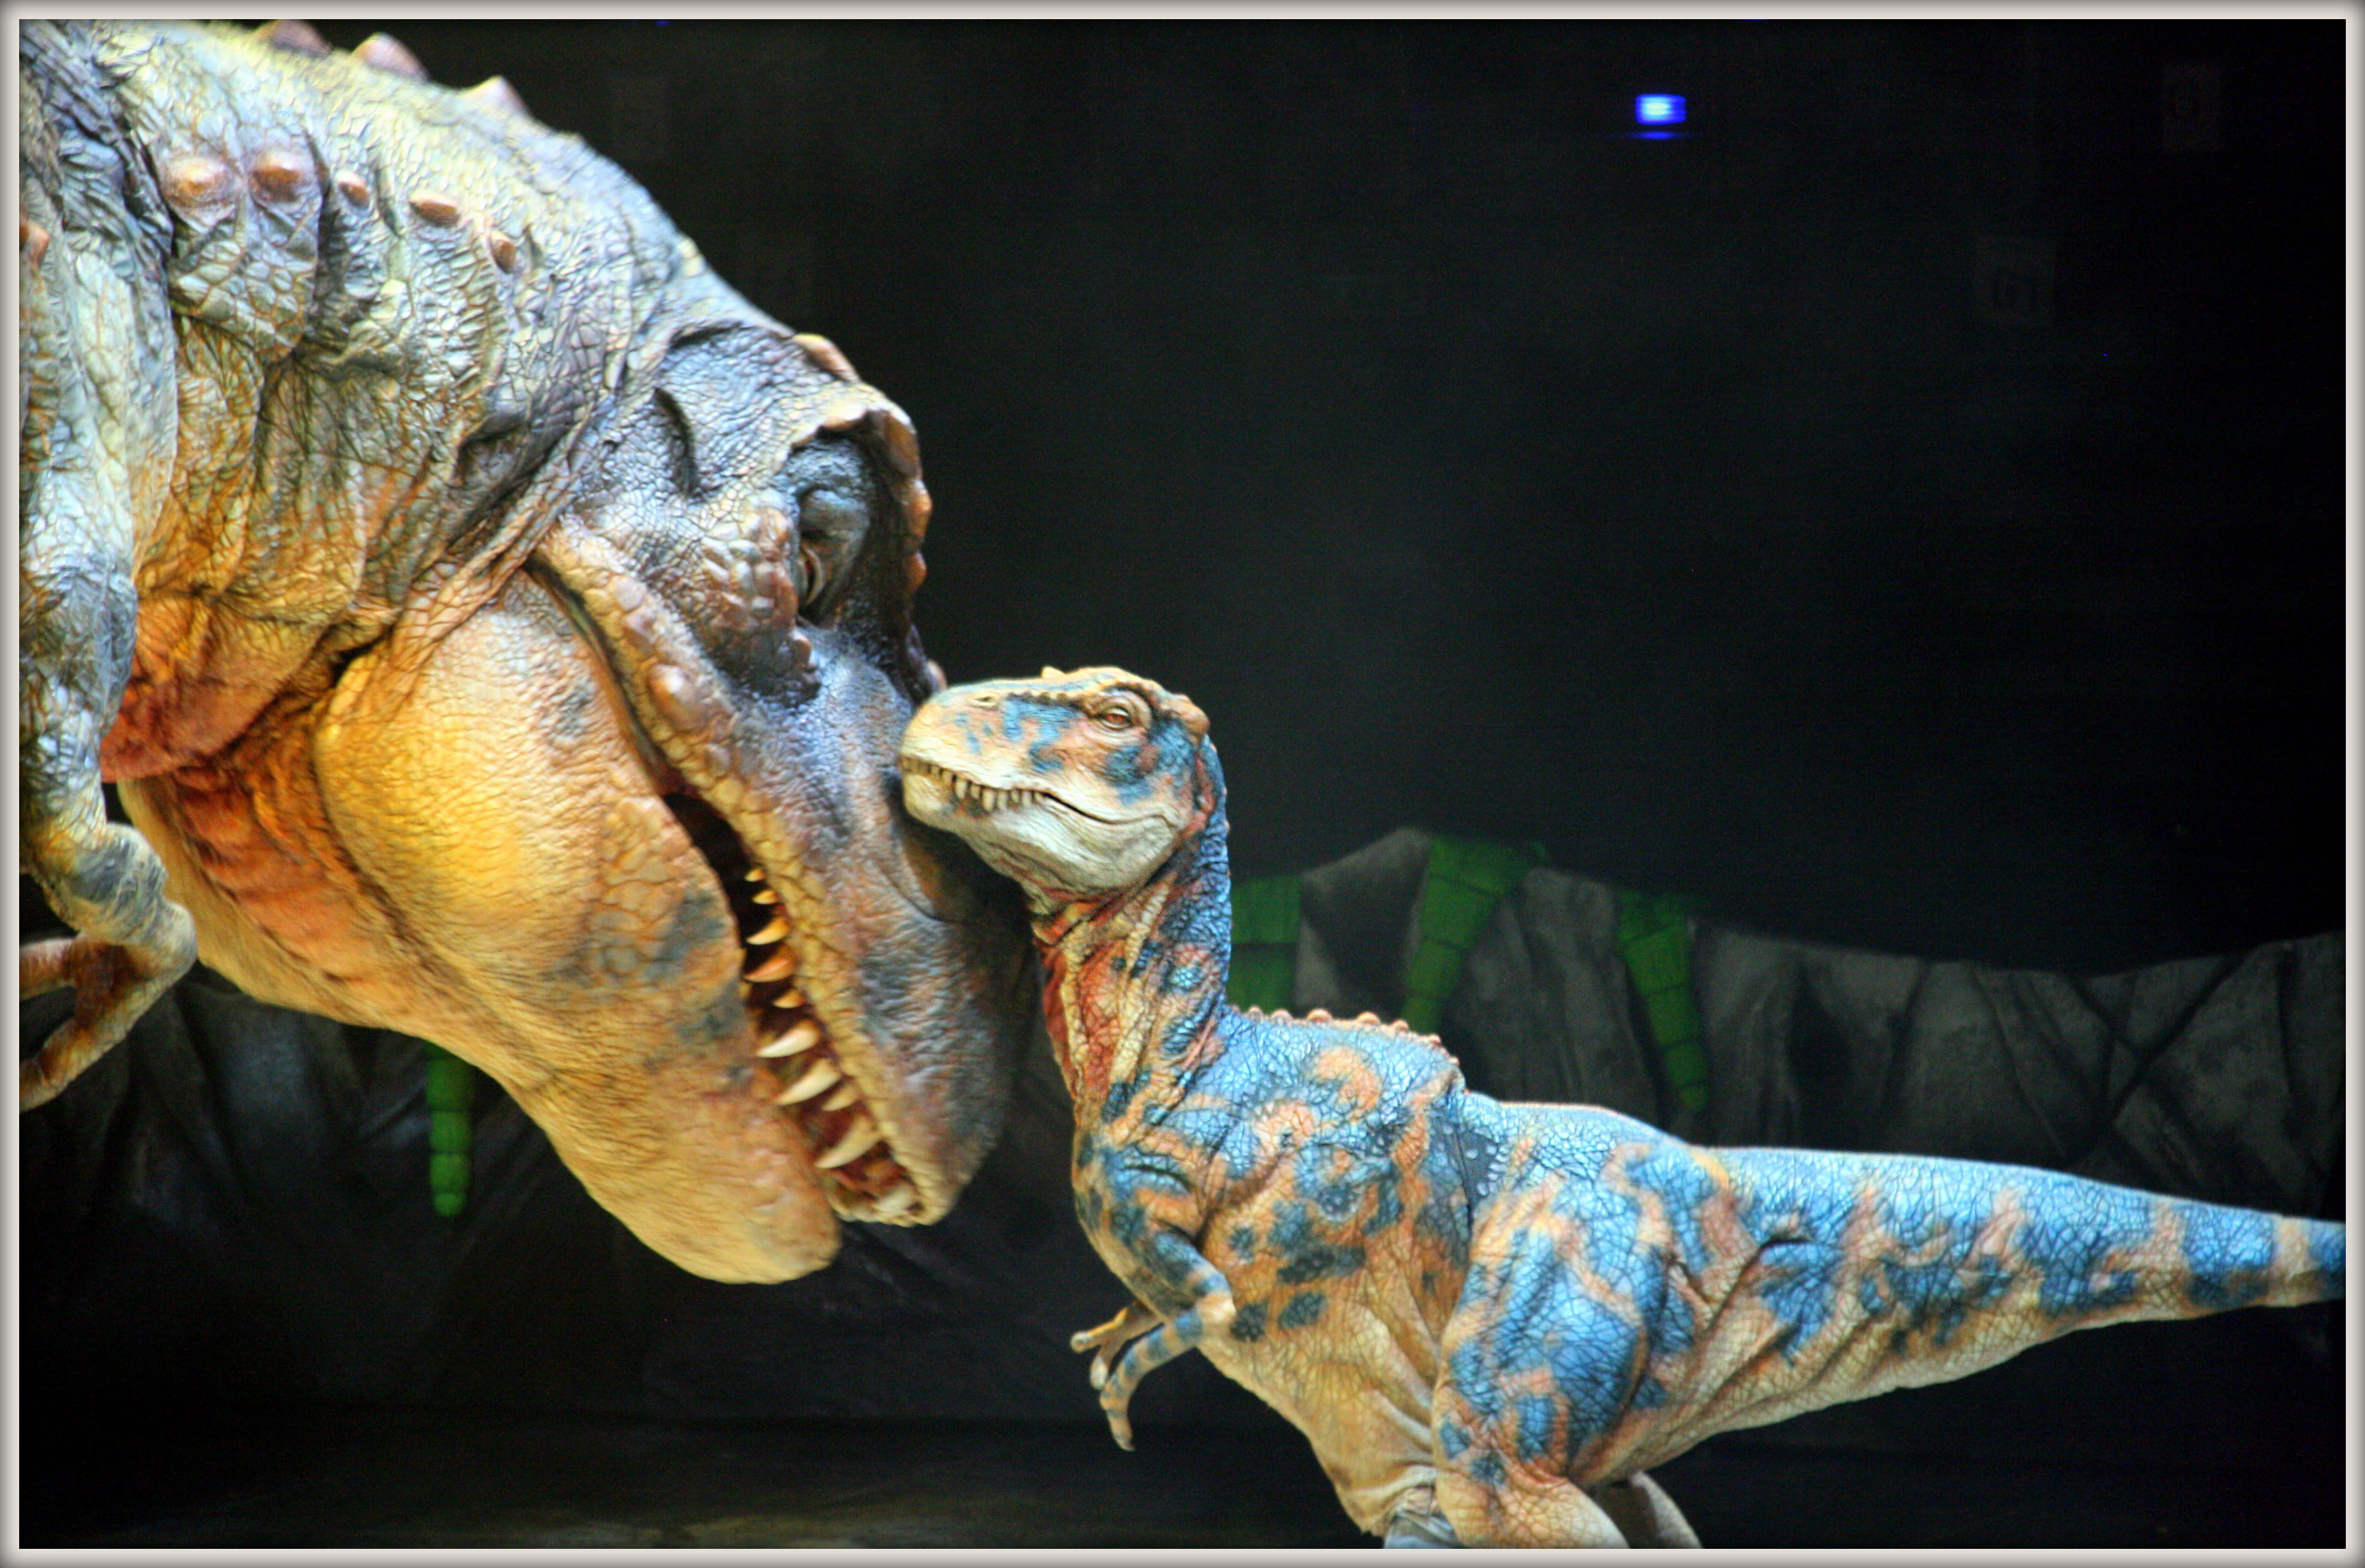 walking with dinosaurs pesaro marzo 2013 (11)